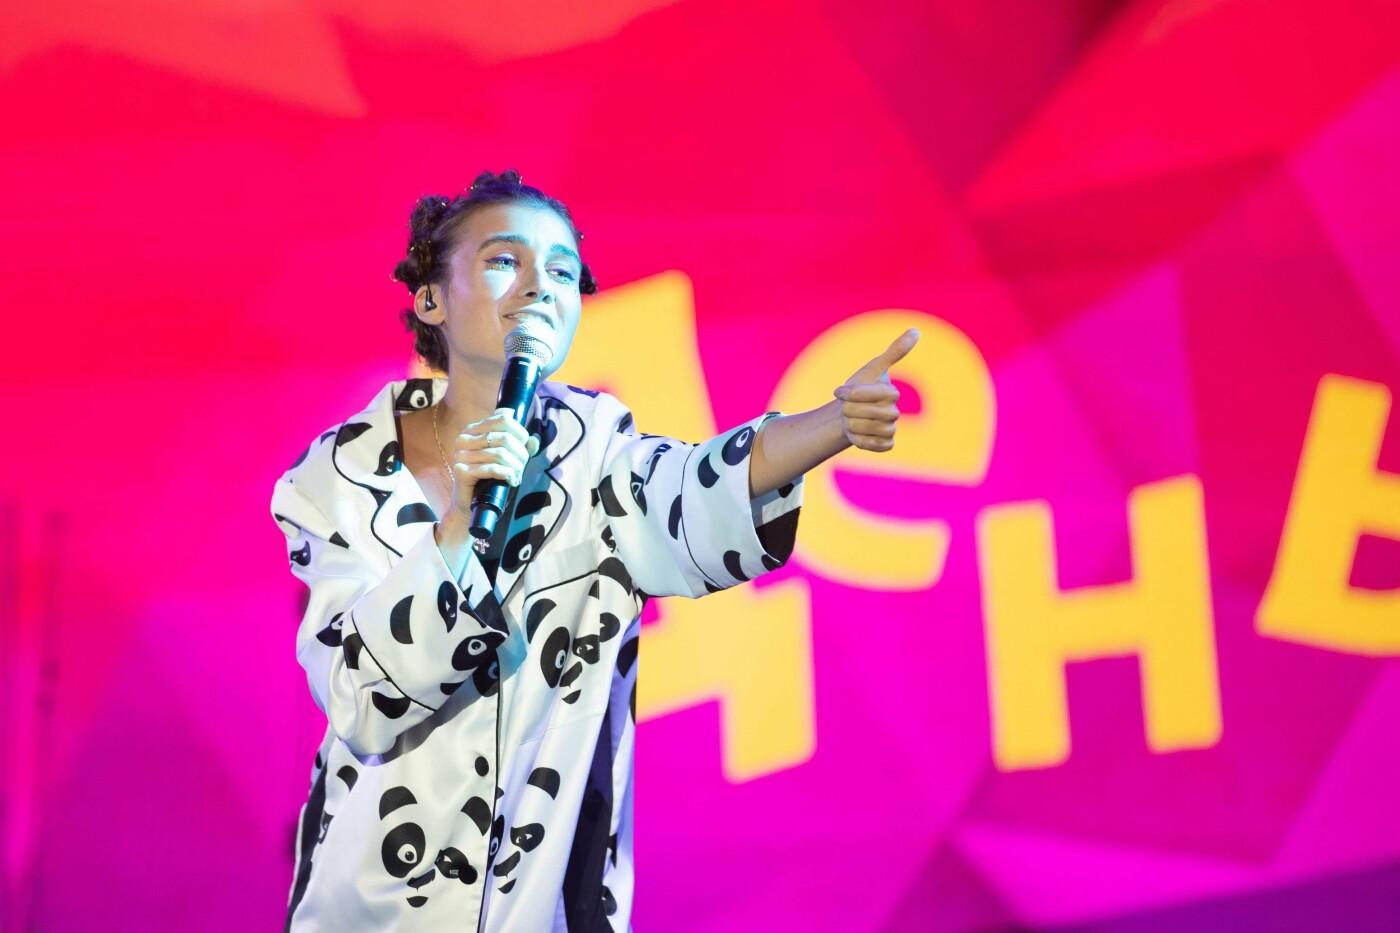 Концерт на набережной собрал десятки тысяч днепрян, - ФОТО, фото-4